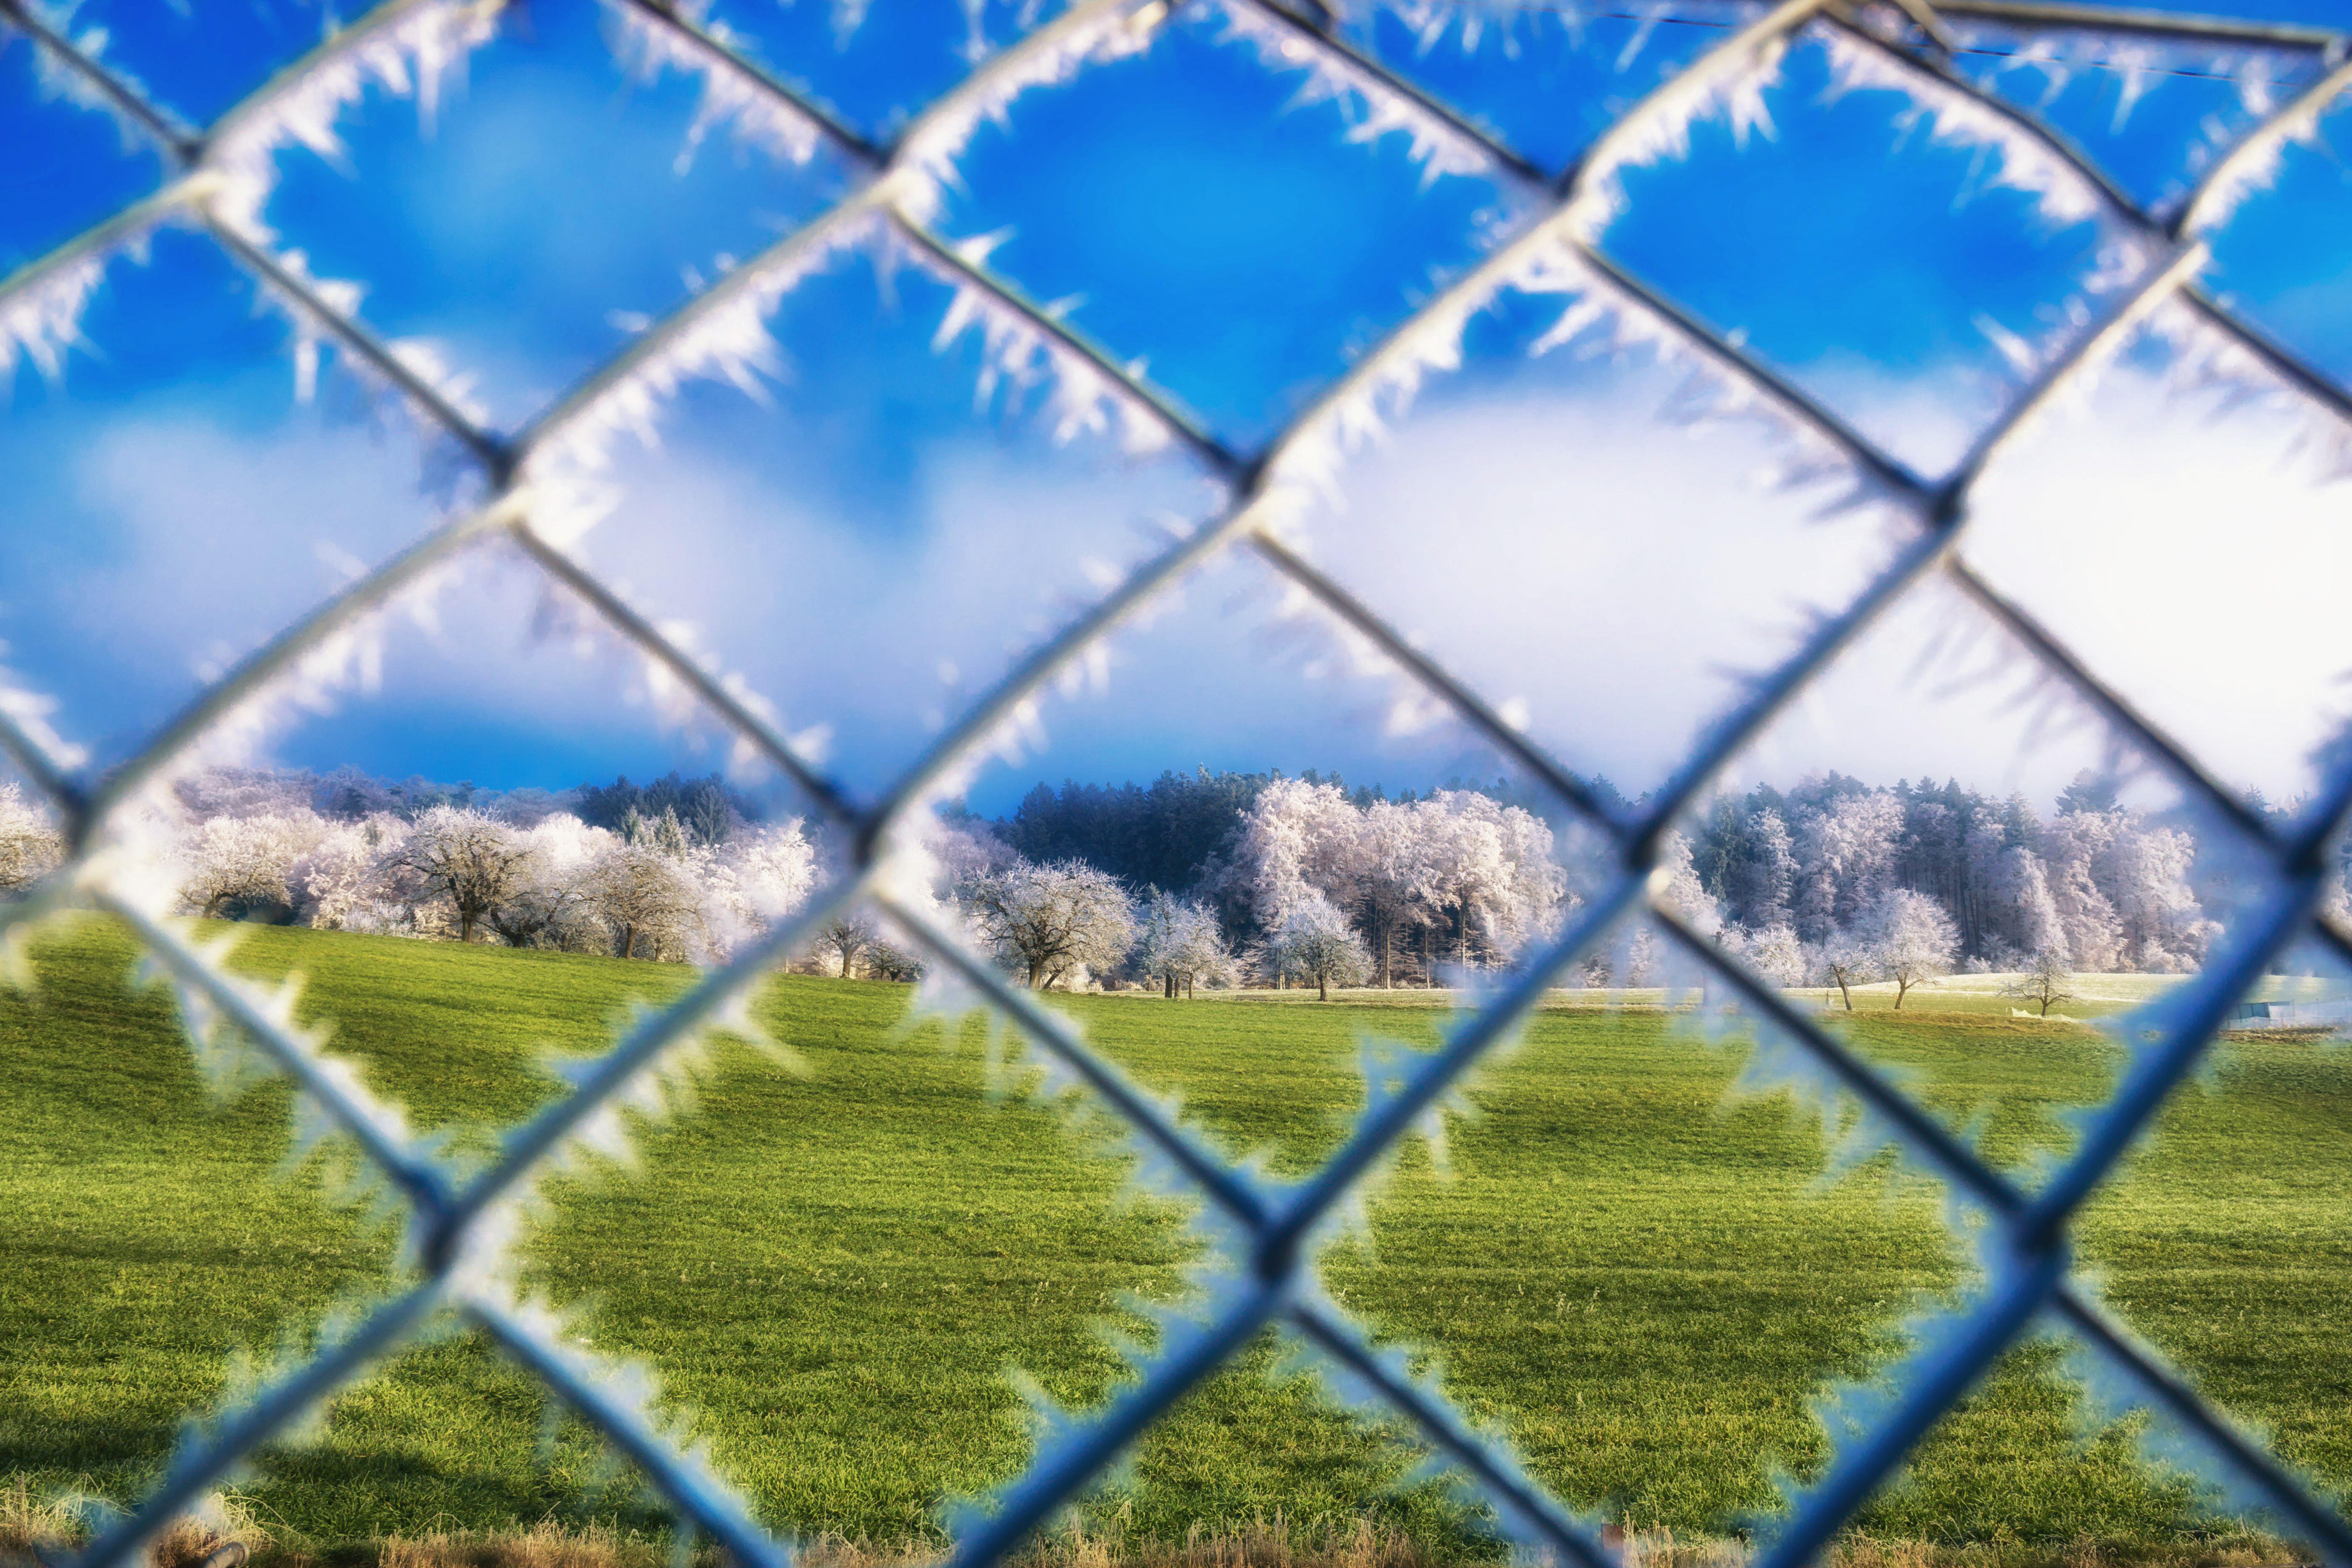 Hintergrundbilder : blau, Drahtzäune, Himmel, Gras, Netz, Struktur ...